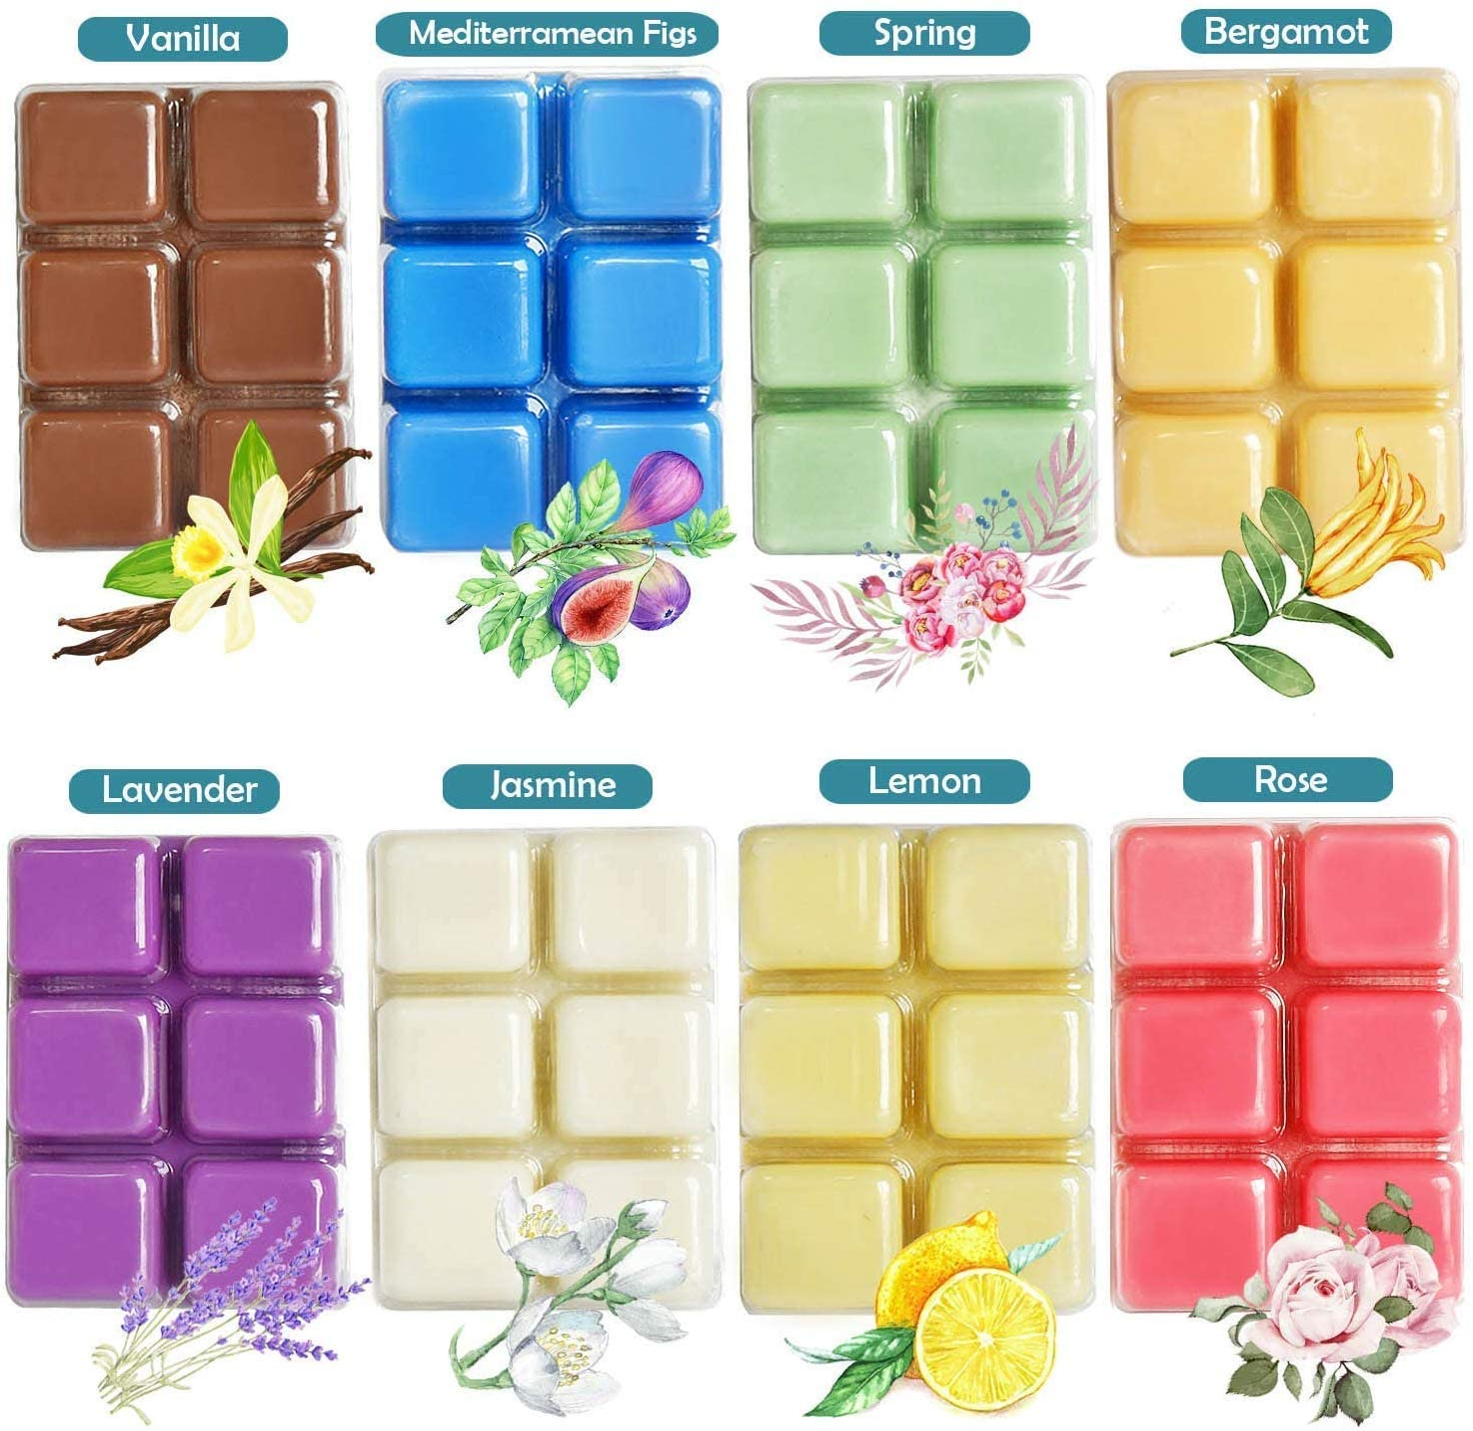 YUCH Wax Melts Air Freshener - Highly Scented Luxury Wax Cubes Gift Set - 8 Fragrances X 6 Cubes - Smells Great - Lemon, Fig, Lavender, Spring Fresh,Rose ,Jasmine,Vanilla,Bergamot